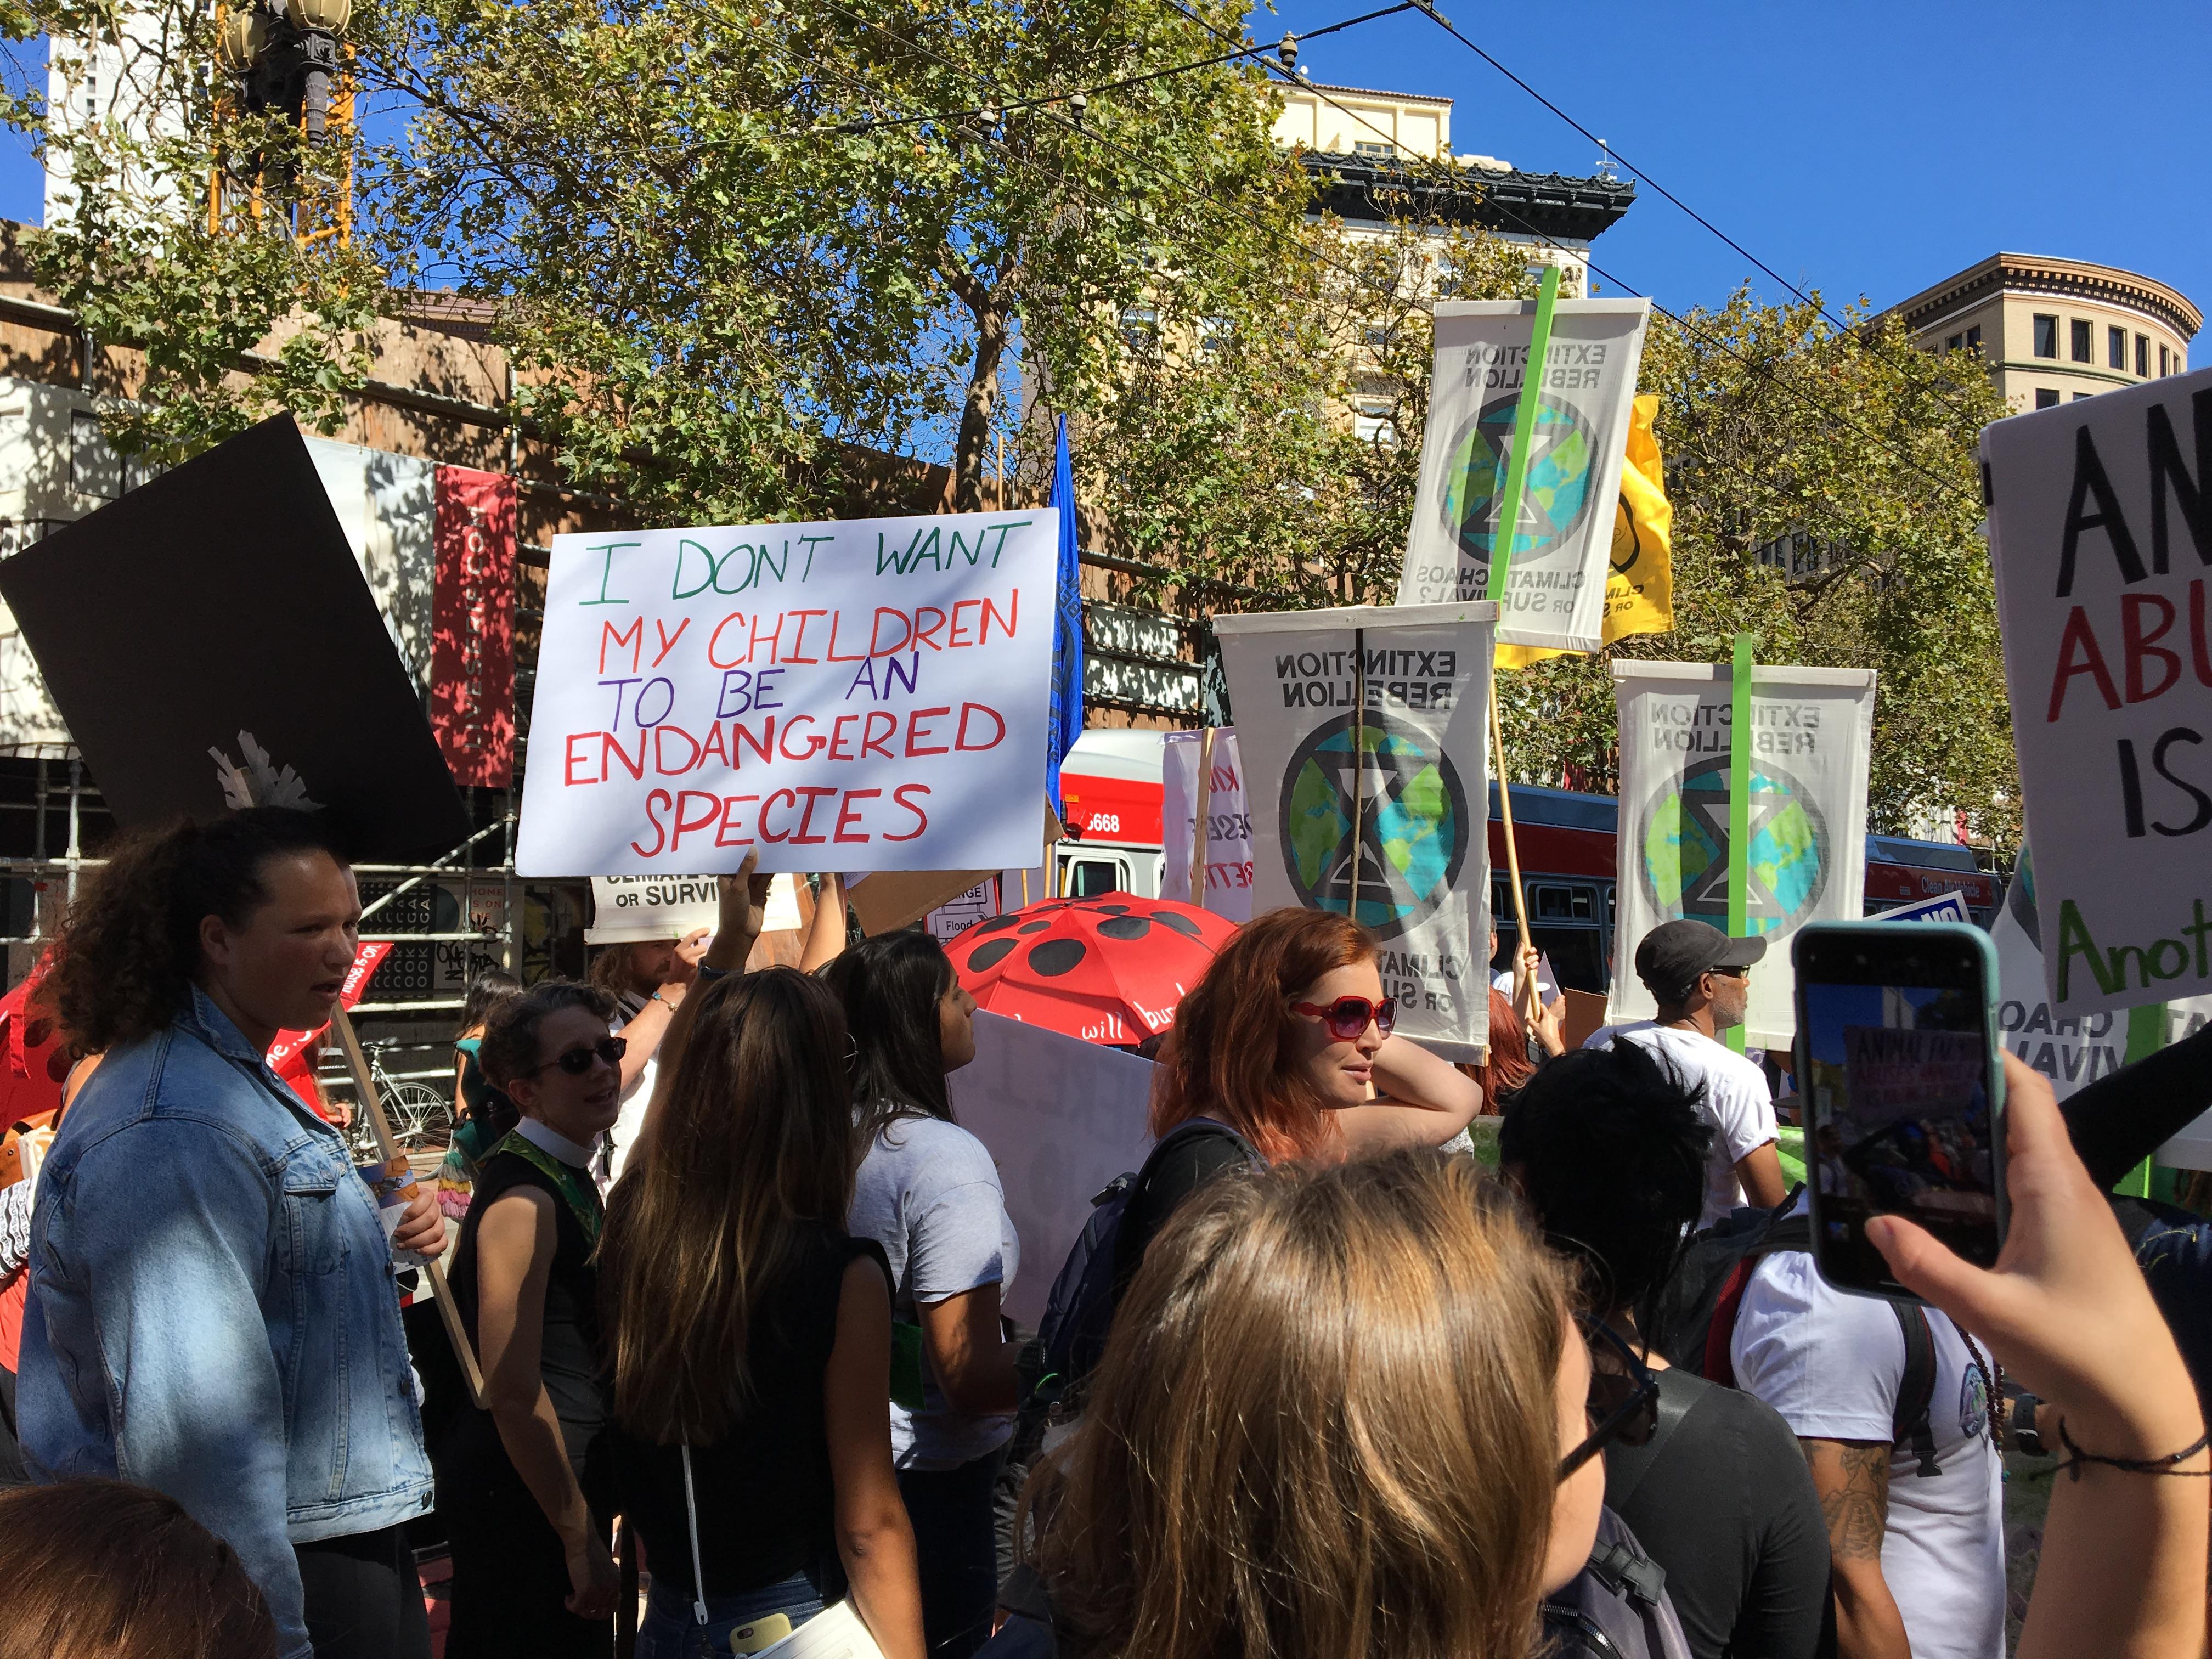 CA_San_Francisco_2019-09-20_11.14.11_Youth_Climate_Strike.jpg